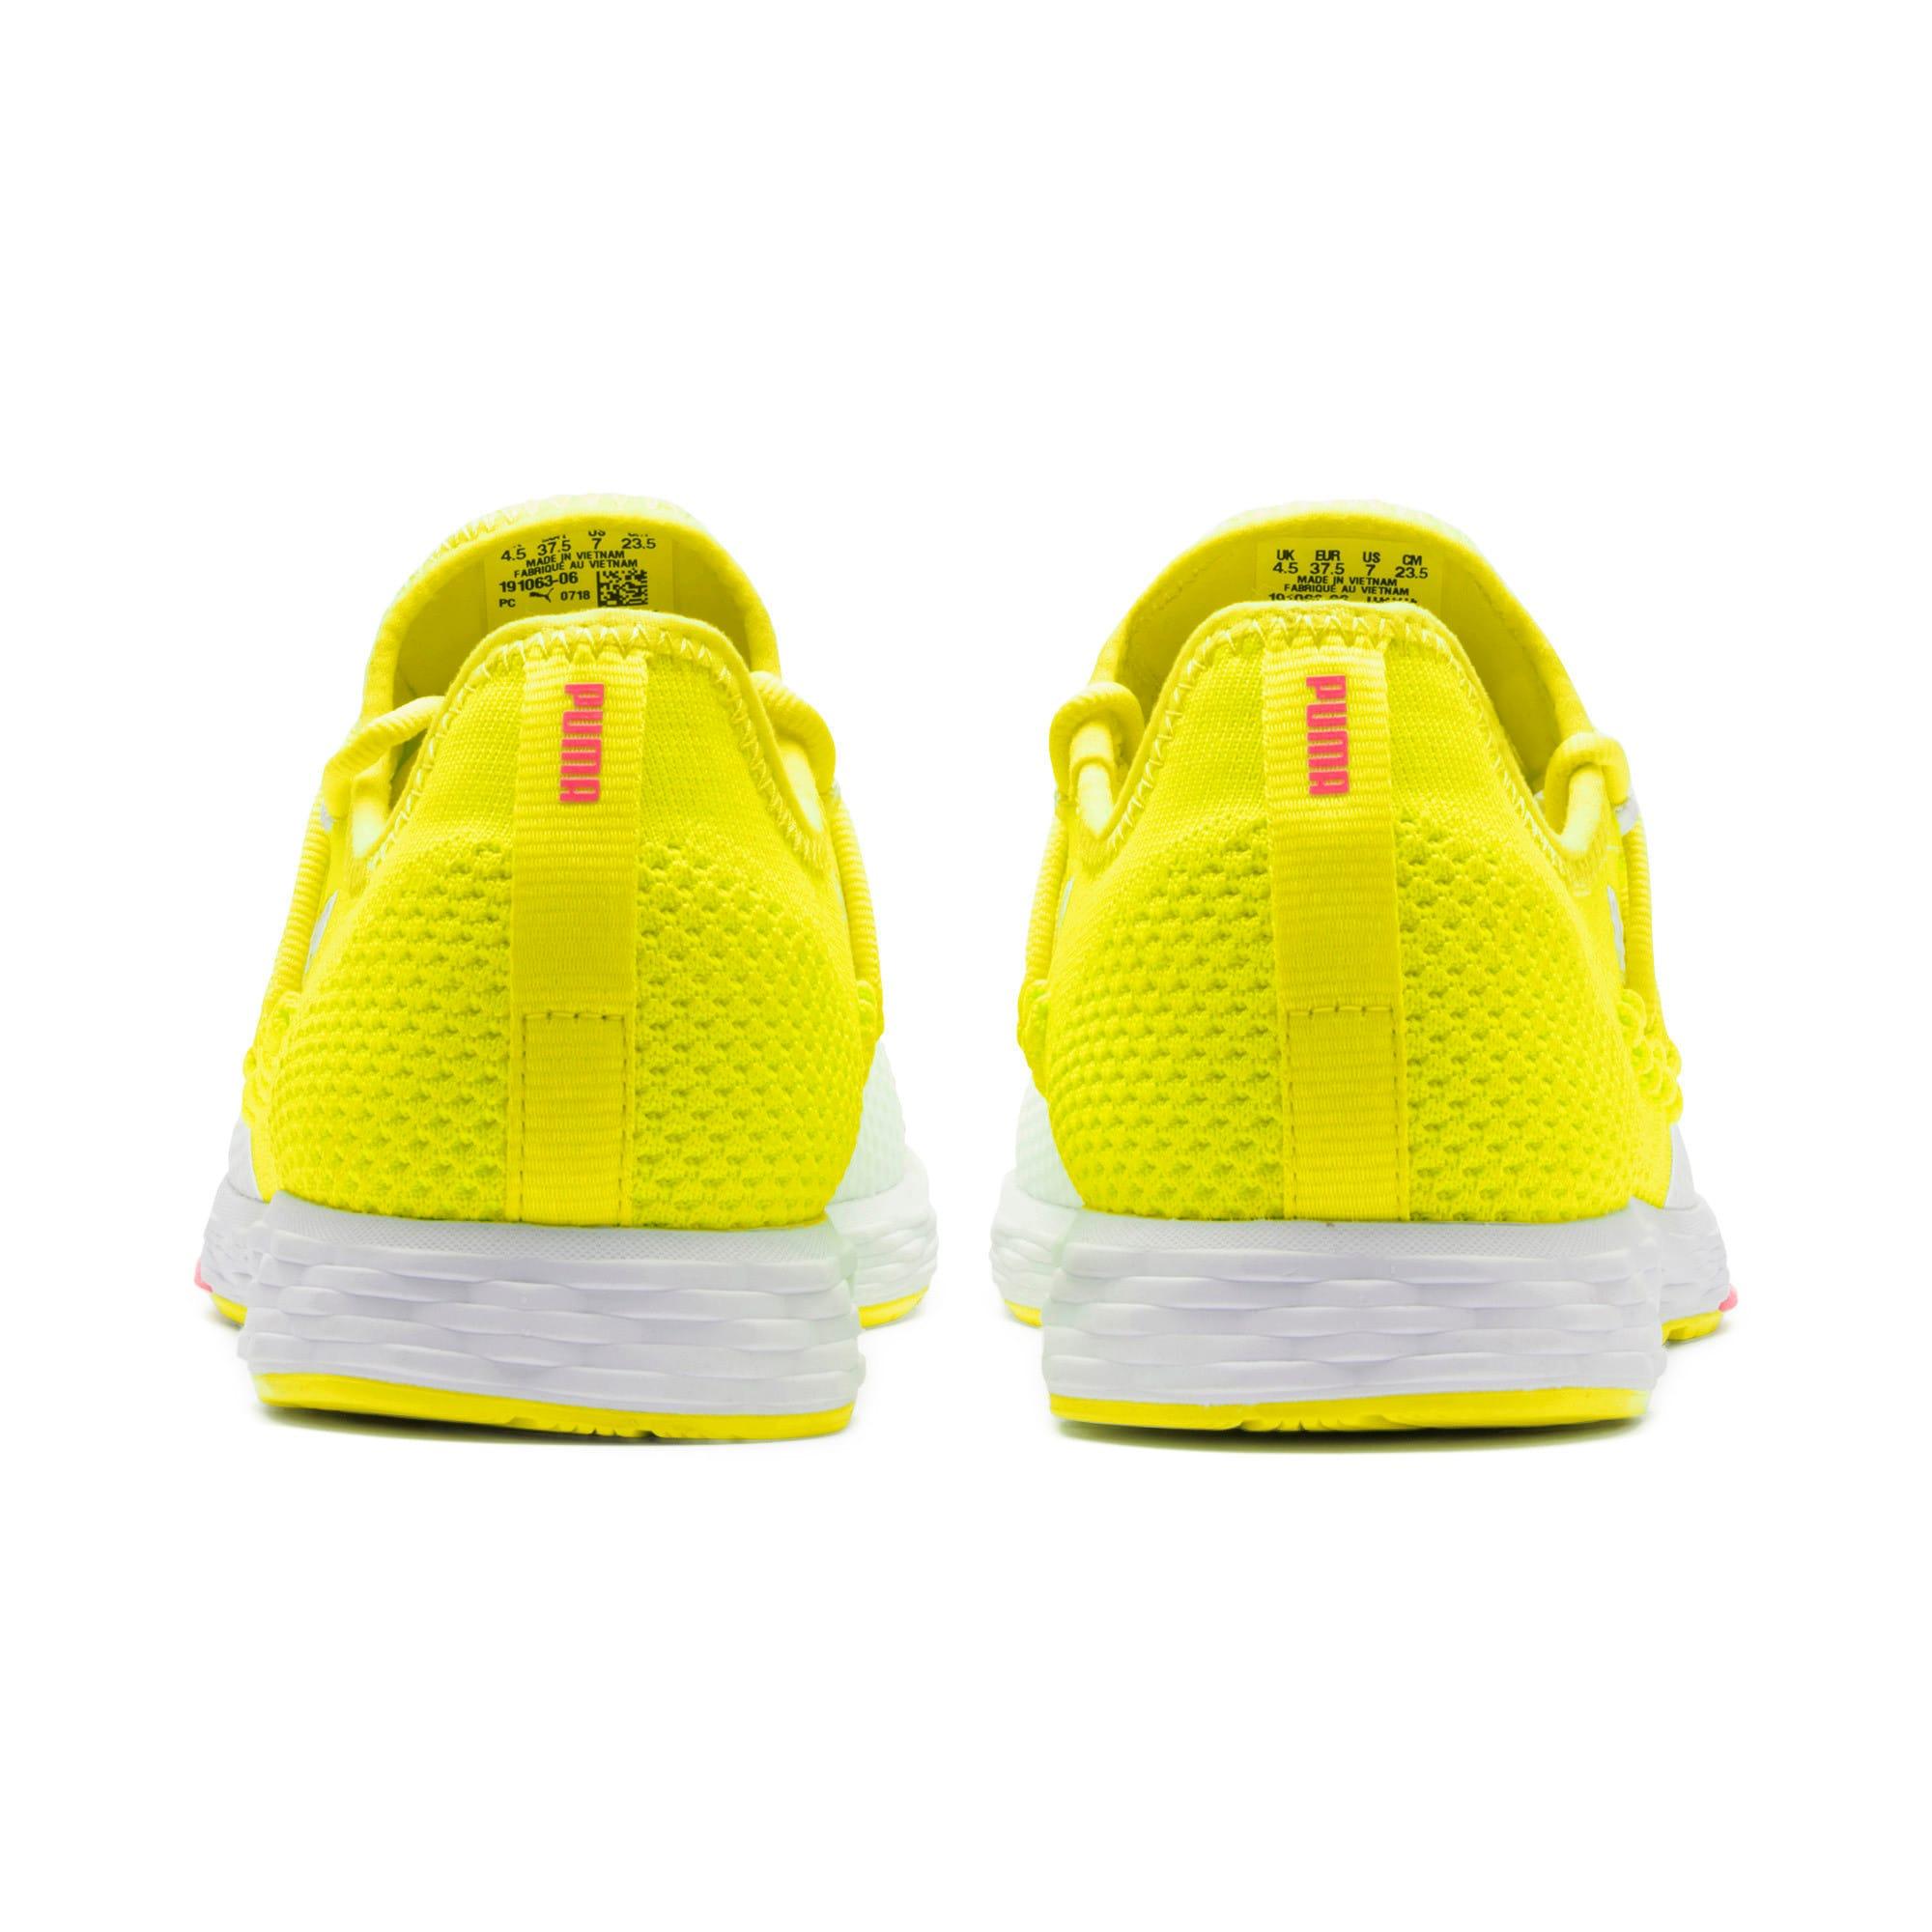 Thumbnail 5 of SPEED RACER Women's Running Shoes, Yellow-White-Pink Alert, medium-IND